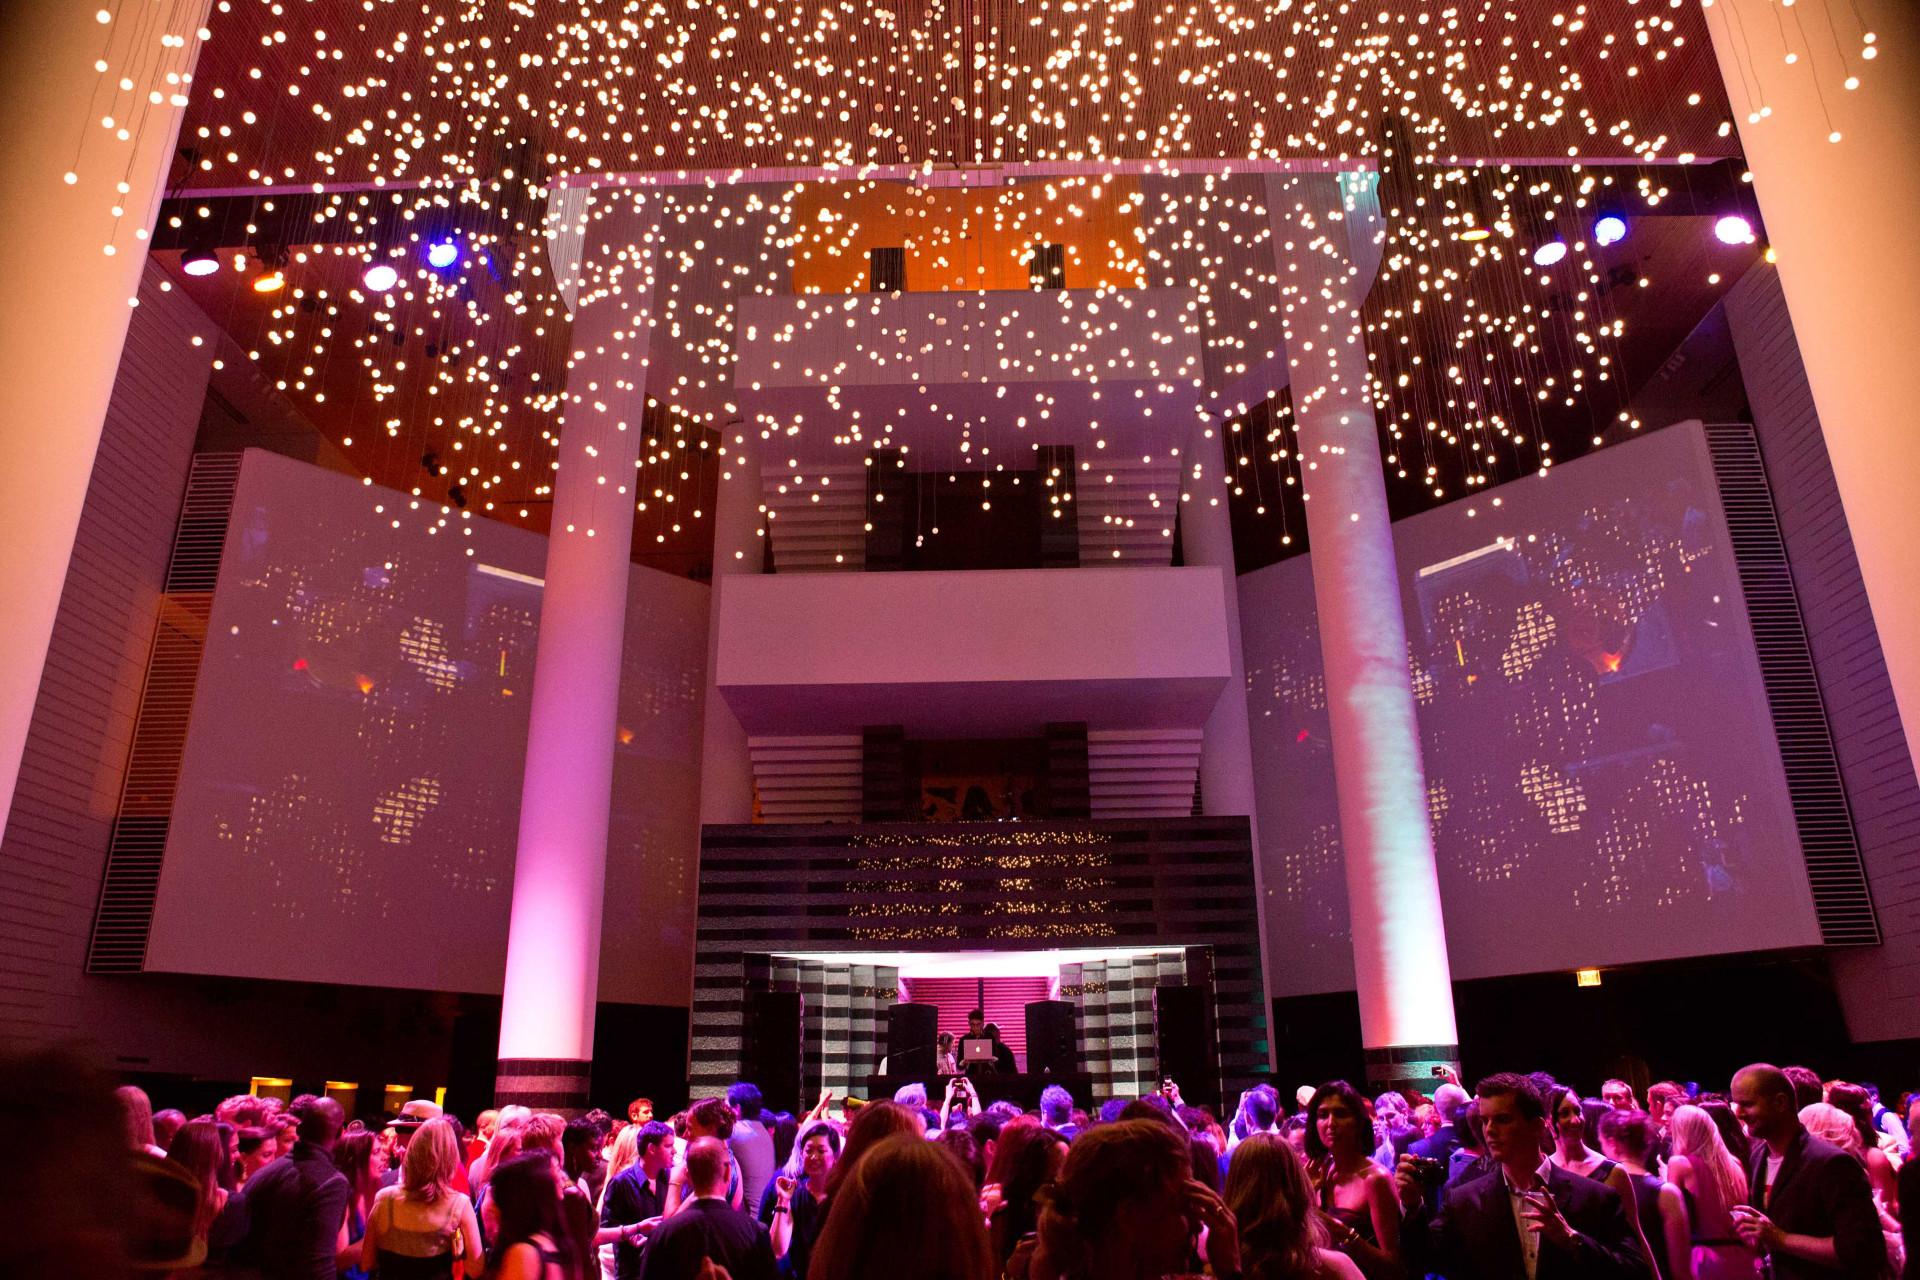 SFMOMA Modern Ball 2012 invitation